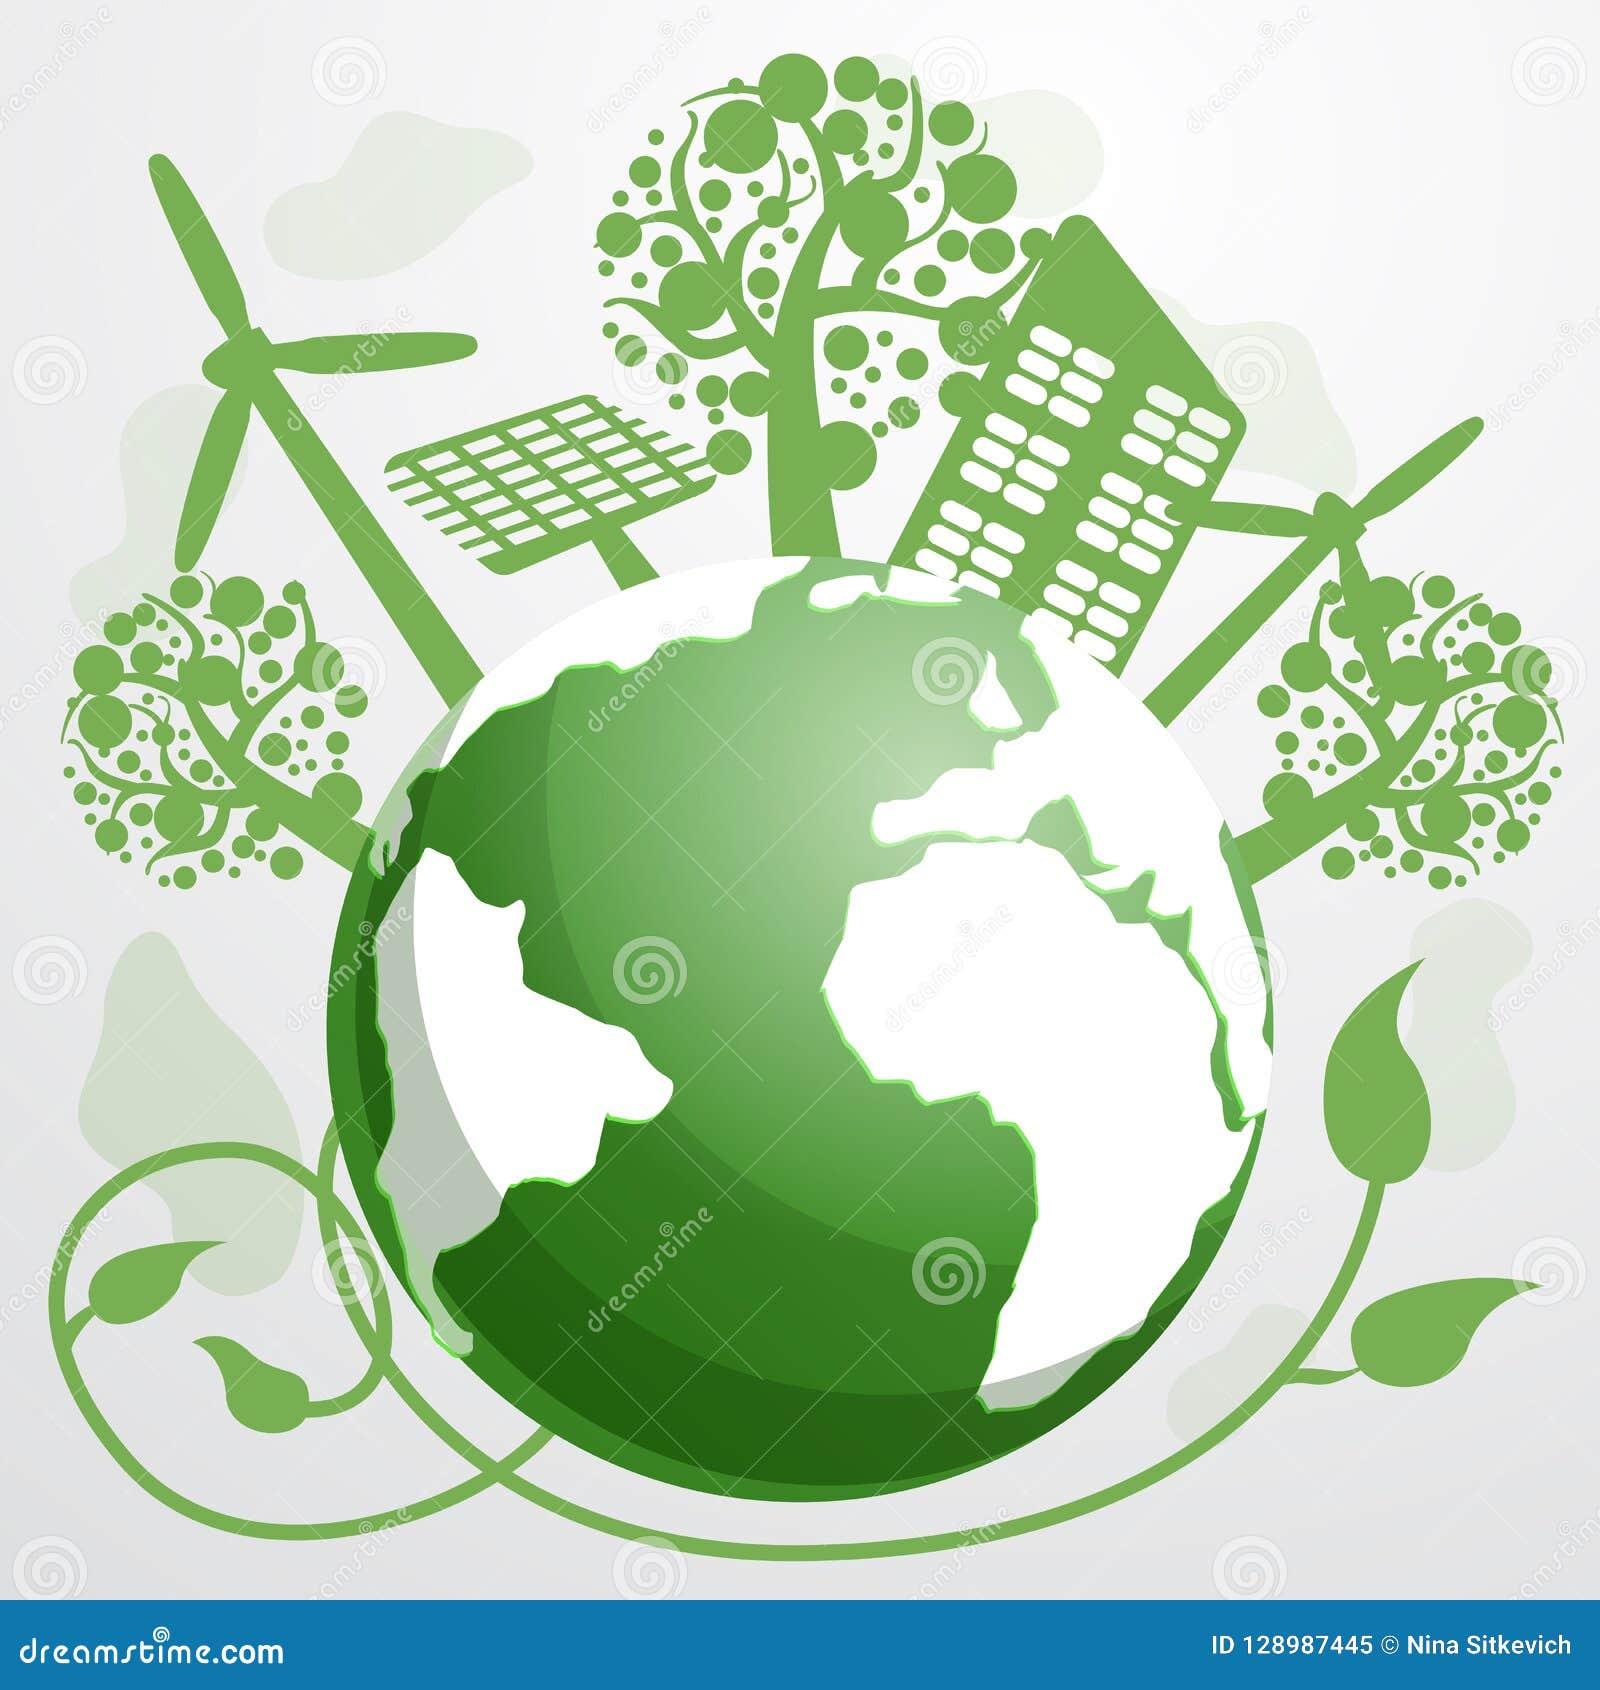 Energy saving concept background, cartoon style